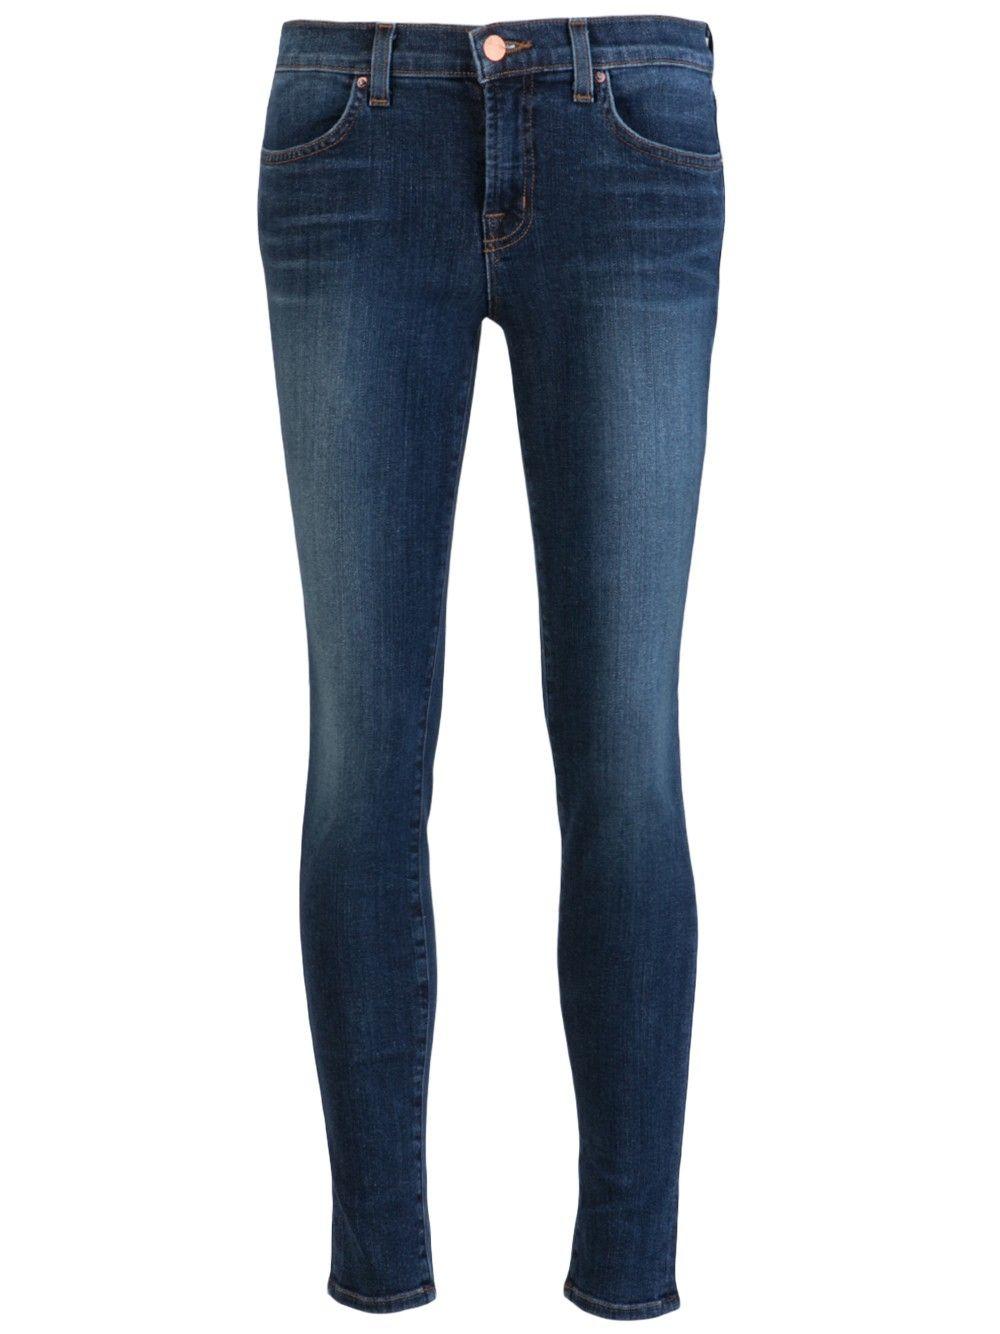 $202-J Brand 620 'Mid-Rise Super Skinny' Trinity Wash-20% off+Free Shipping! #JBrand #Jeans